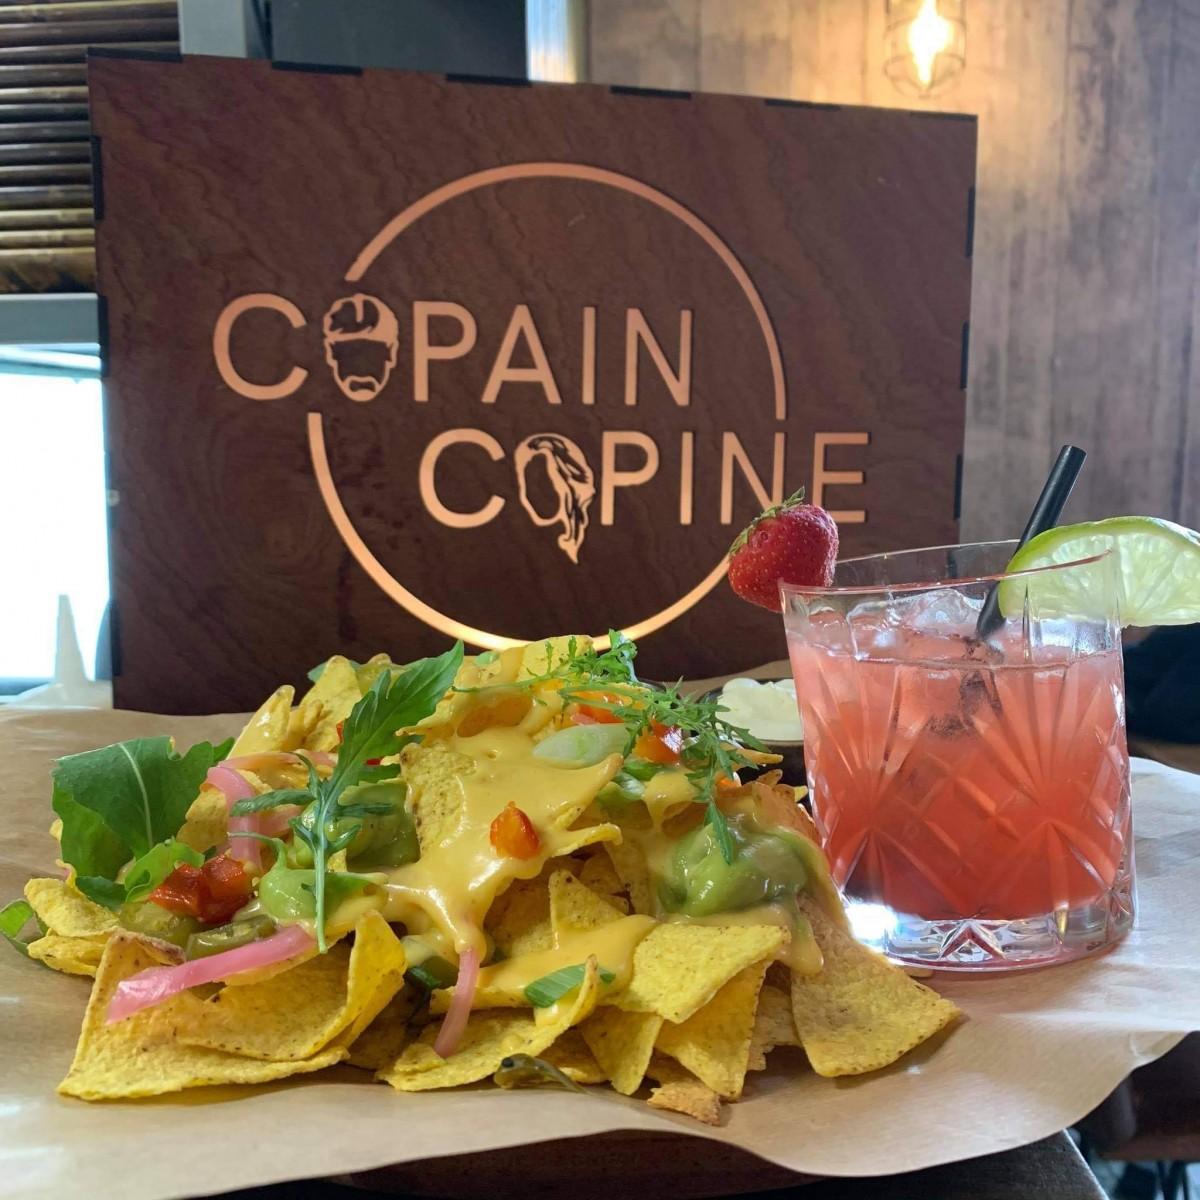 CopainCopine